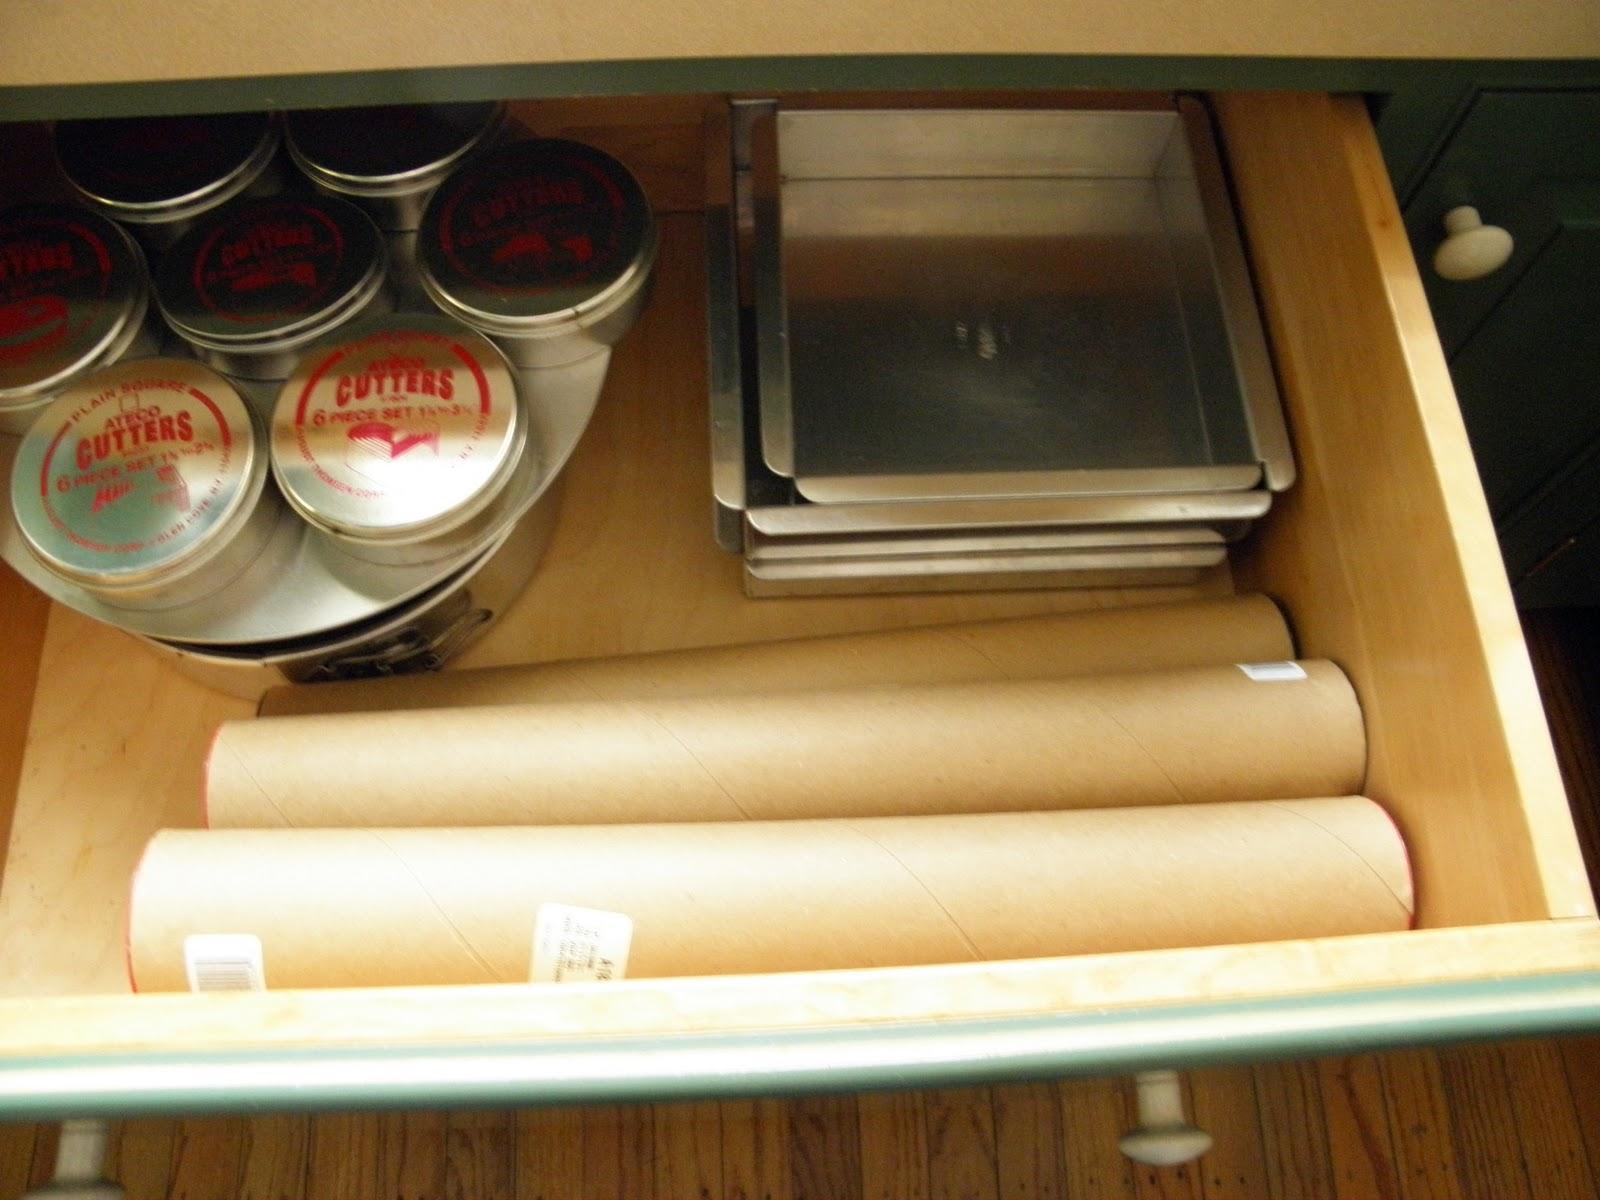 good things by david organizing baking equipment batterie de cuisine. Black Bedroom Furniture Sets. Home Design Ideas